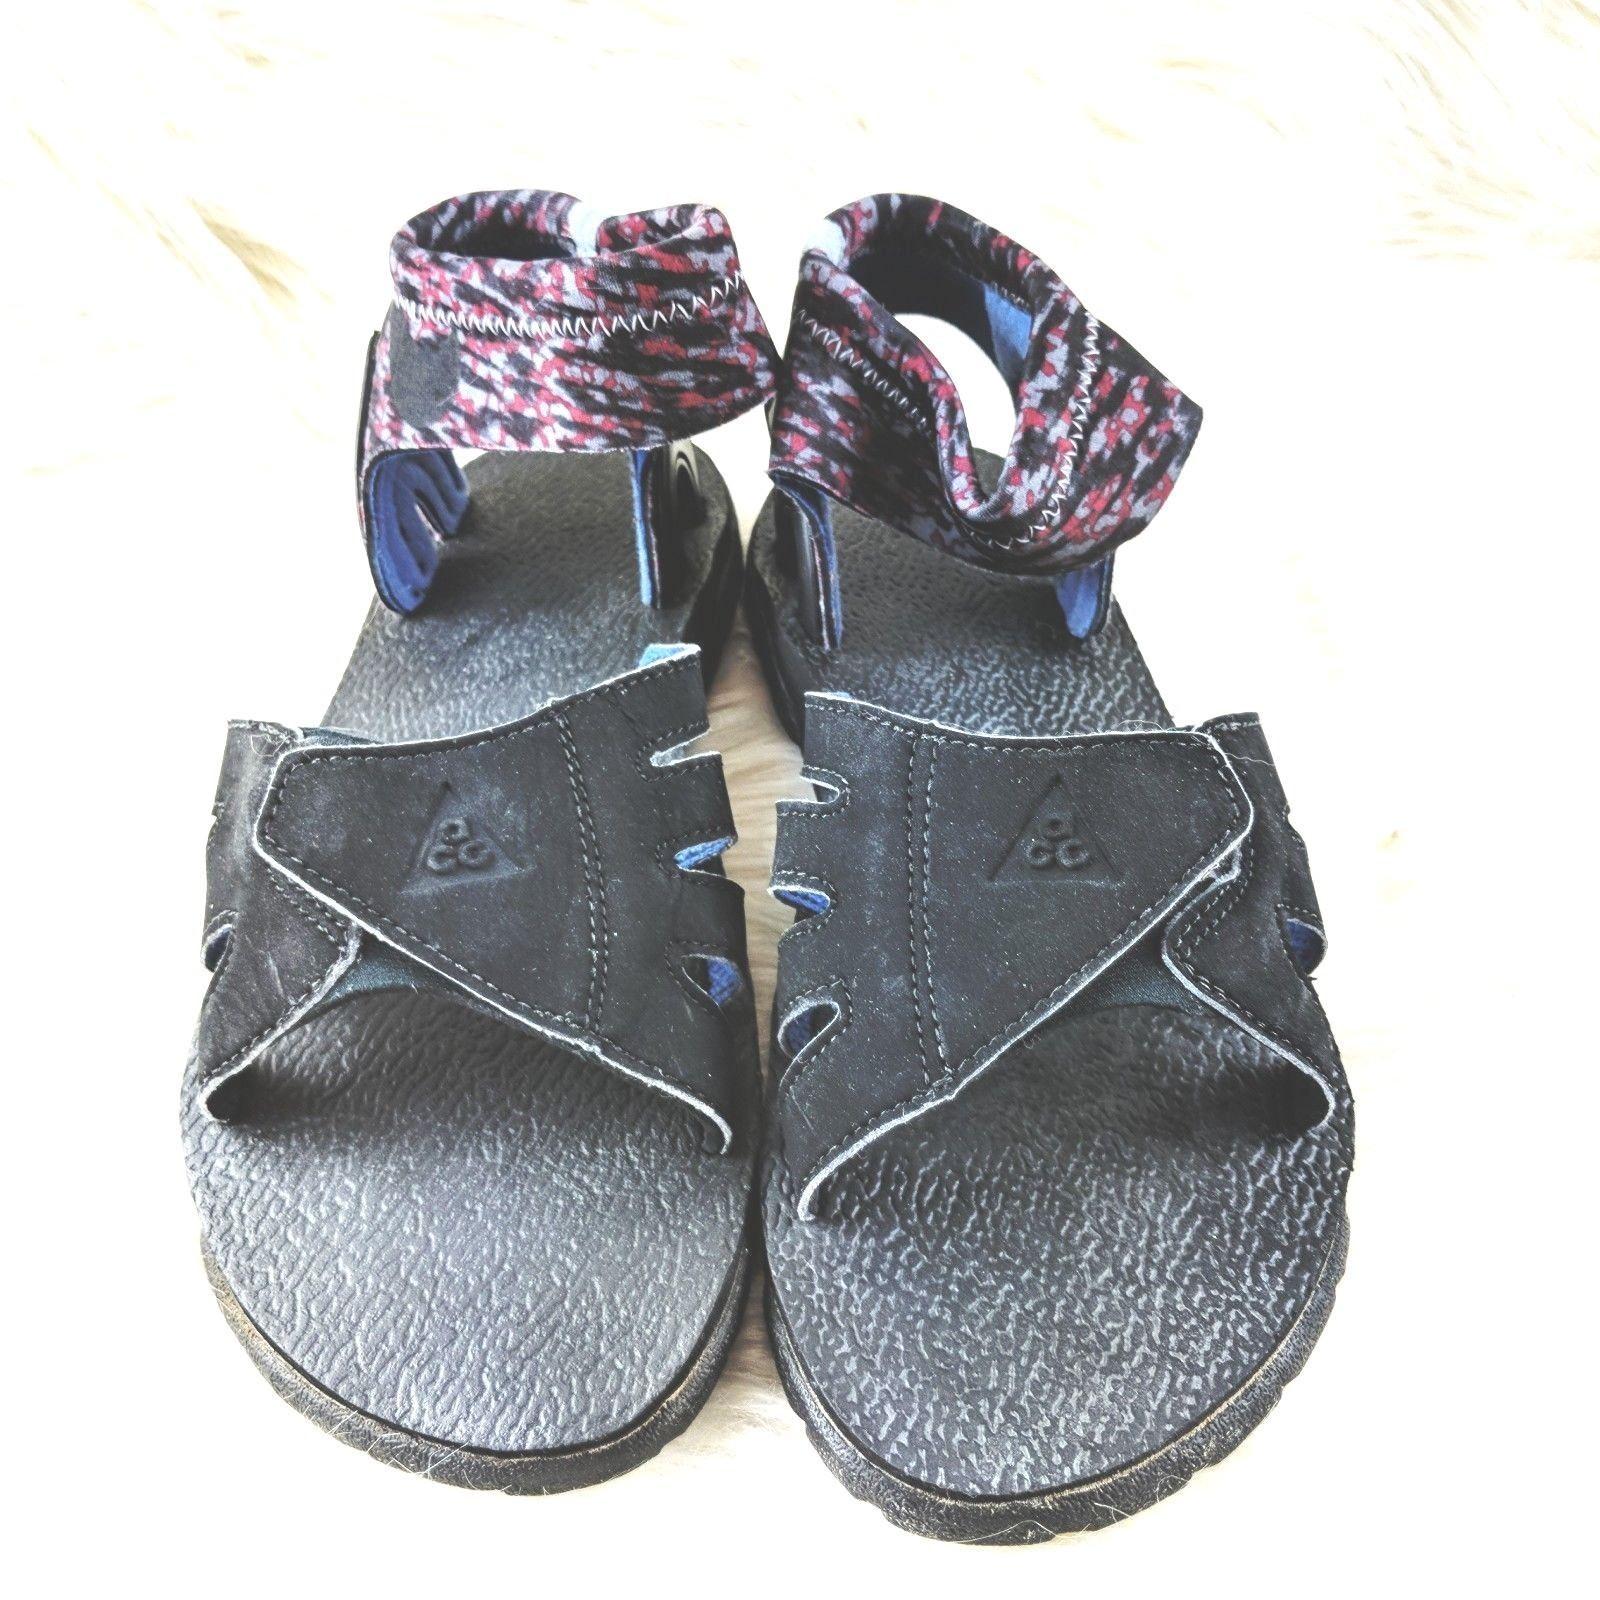 7ba1bf495c7fe ... hot nike acg huarache sandal neoprene ankle support mens size 9 black  vintage ge4 0f228 dbeec